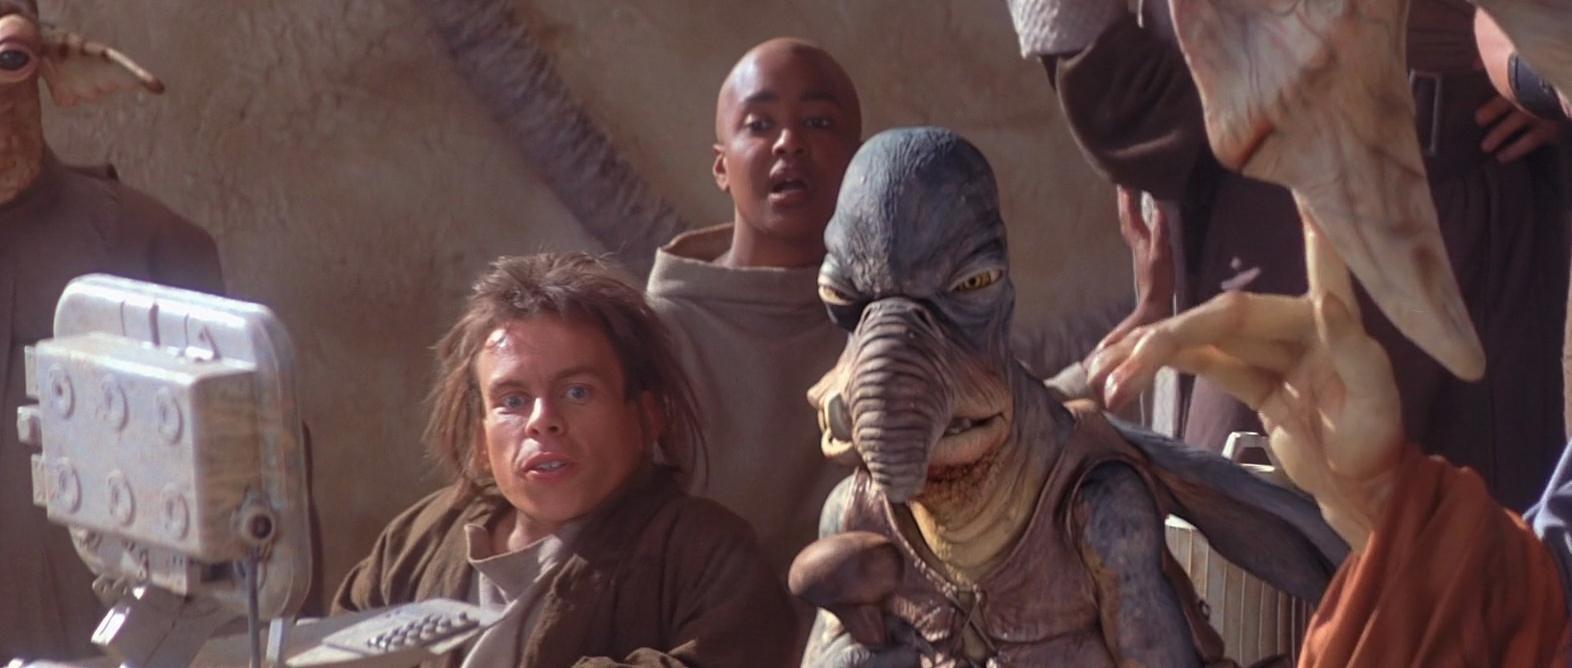 مشاهدة فيلم Star Wars Episode I - The Phantom Menace 1999 HD مترجم كامل اون لاين